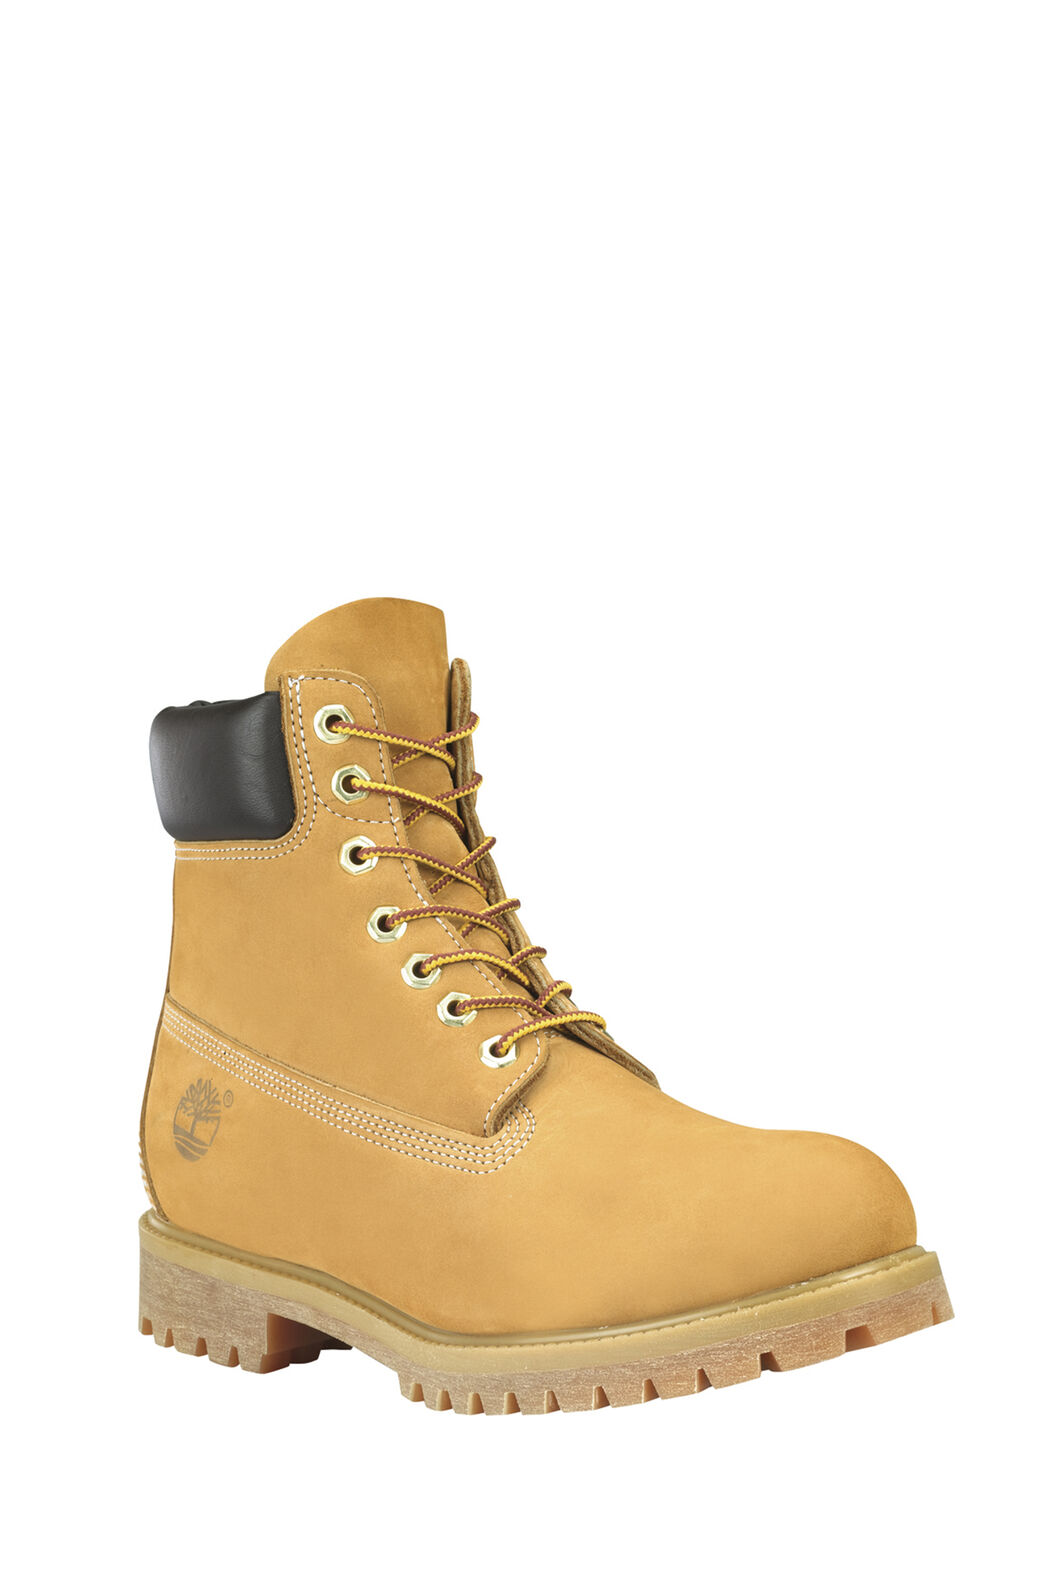 Timberland 6-Inch Premium WP Boots — Men's, WHEAT NUBUCK, hi-res